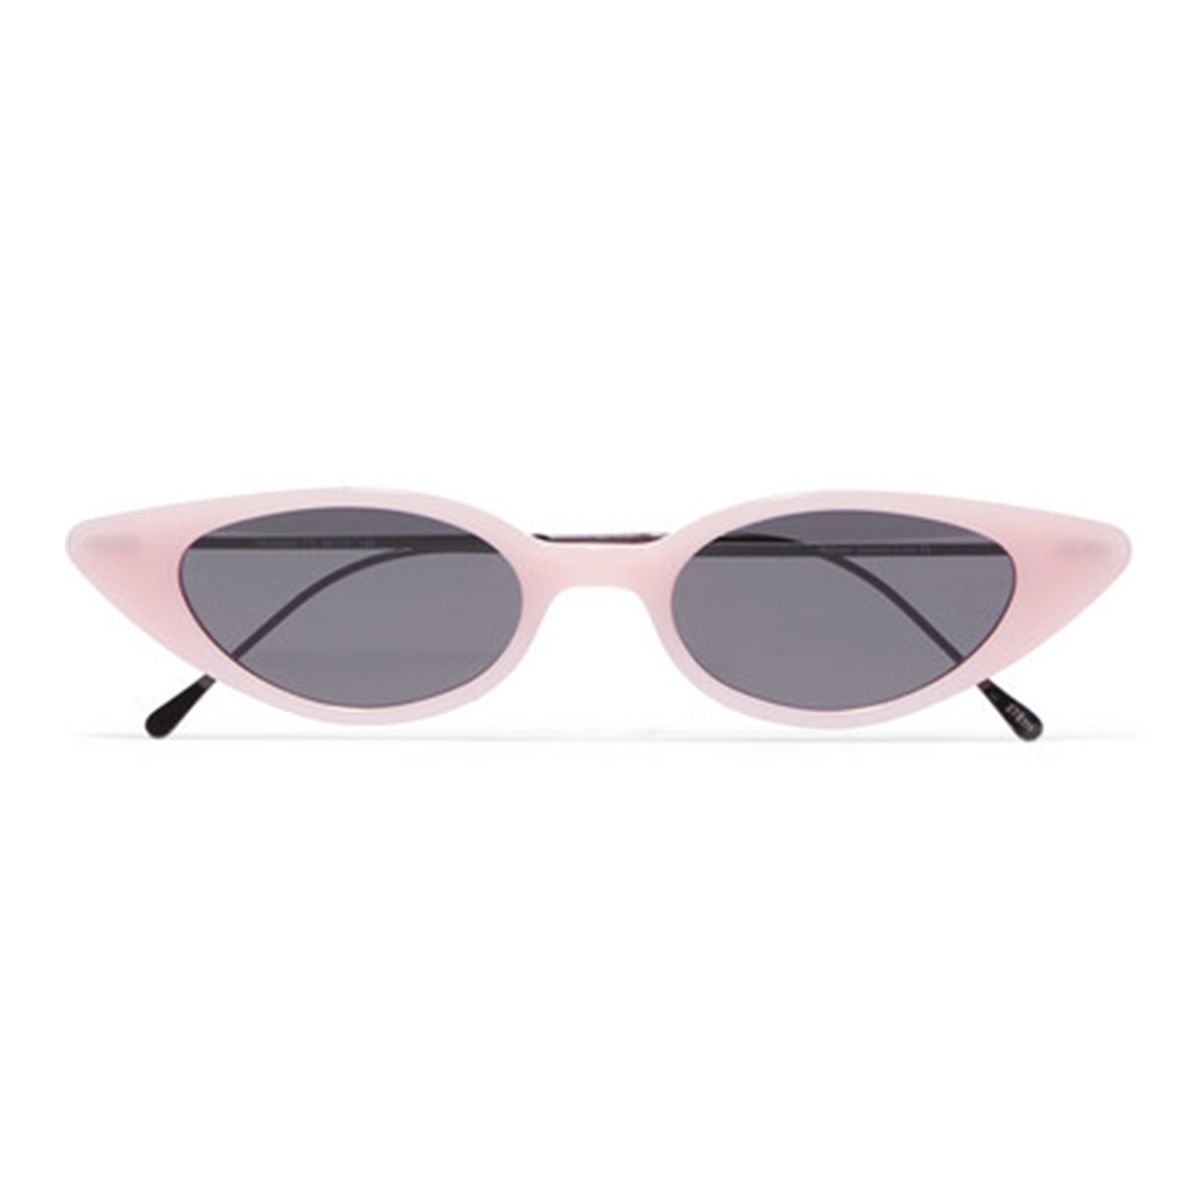 Marianne cat-eye acetate and gunmetal-tone sunglasses